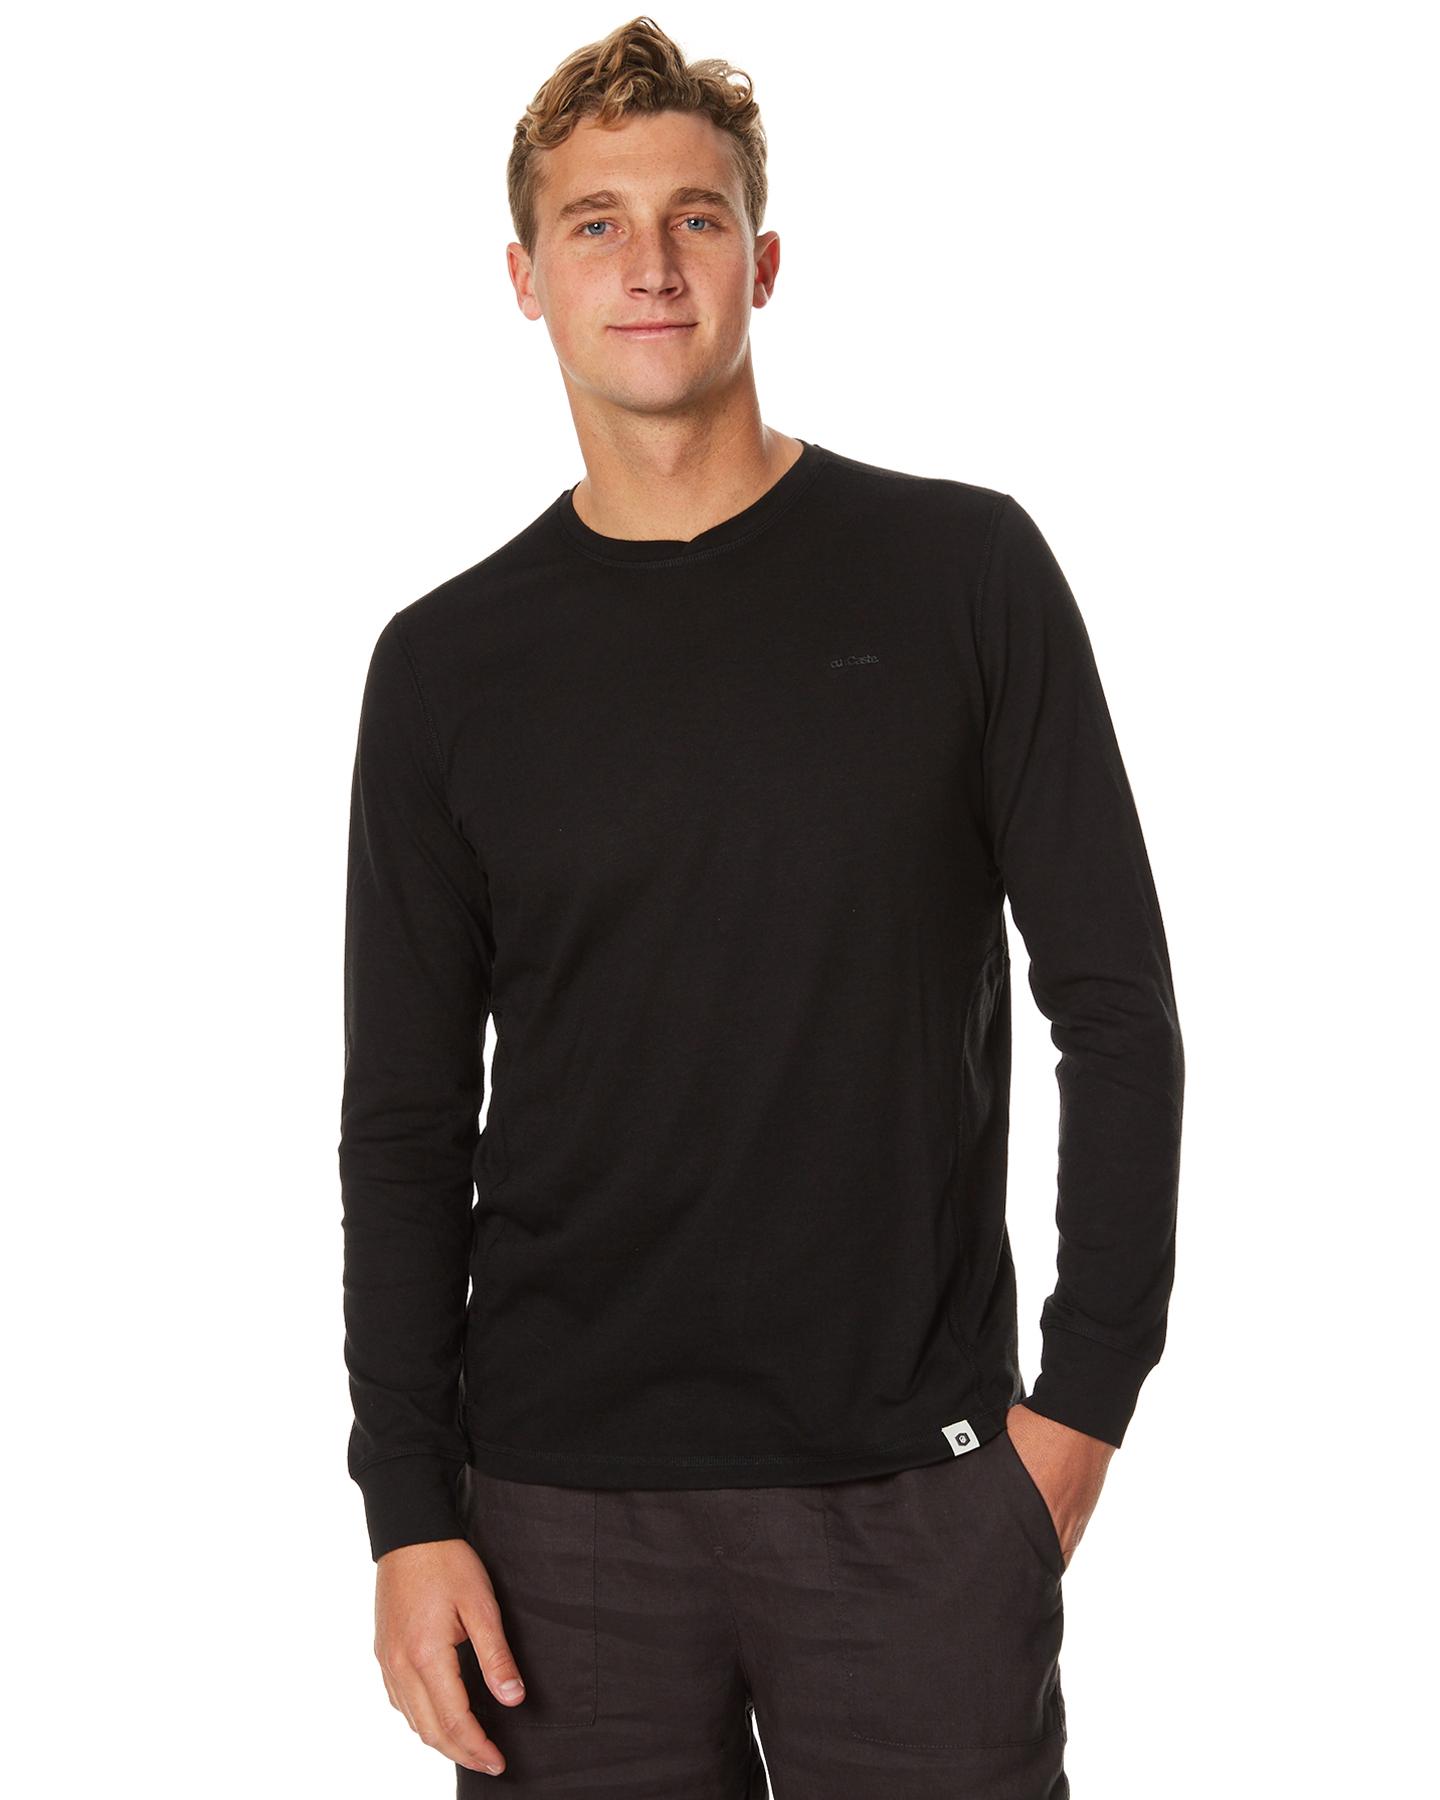 ourcaste brady mens pullover black surfstitch